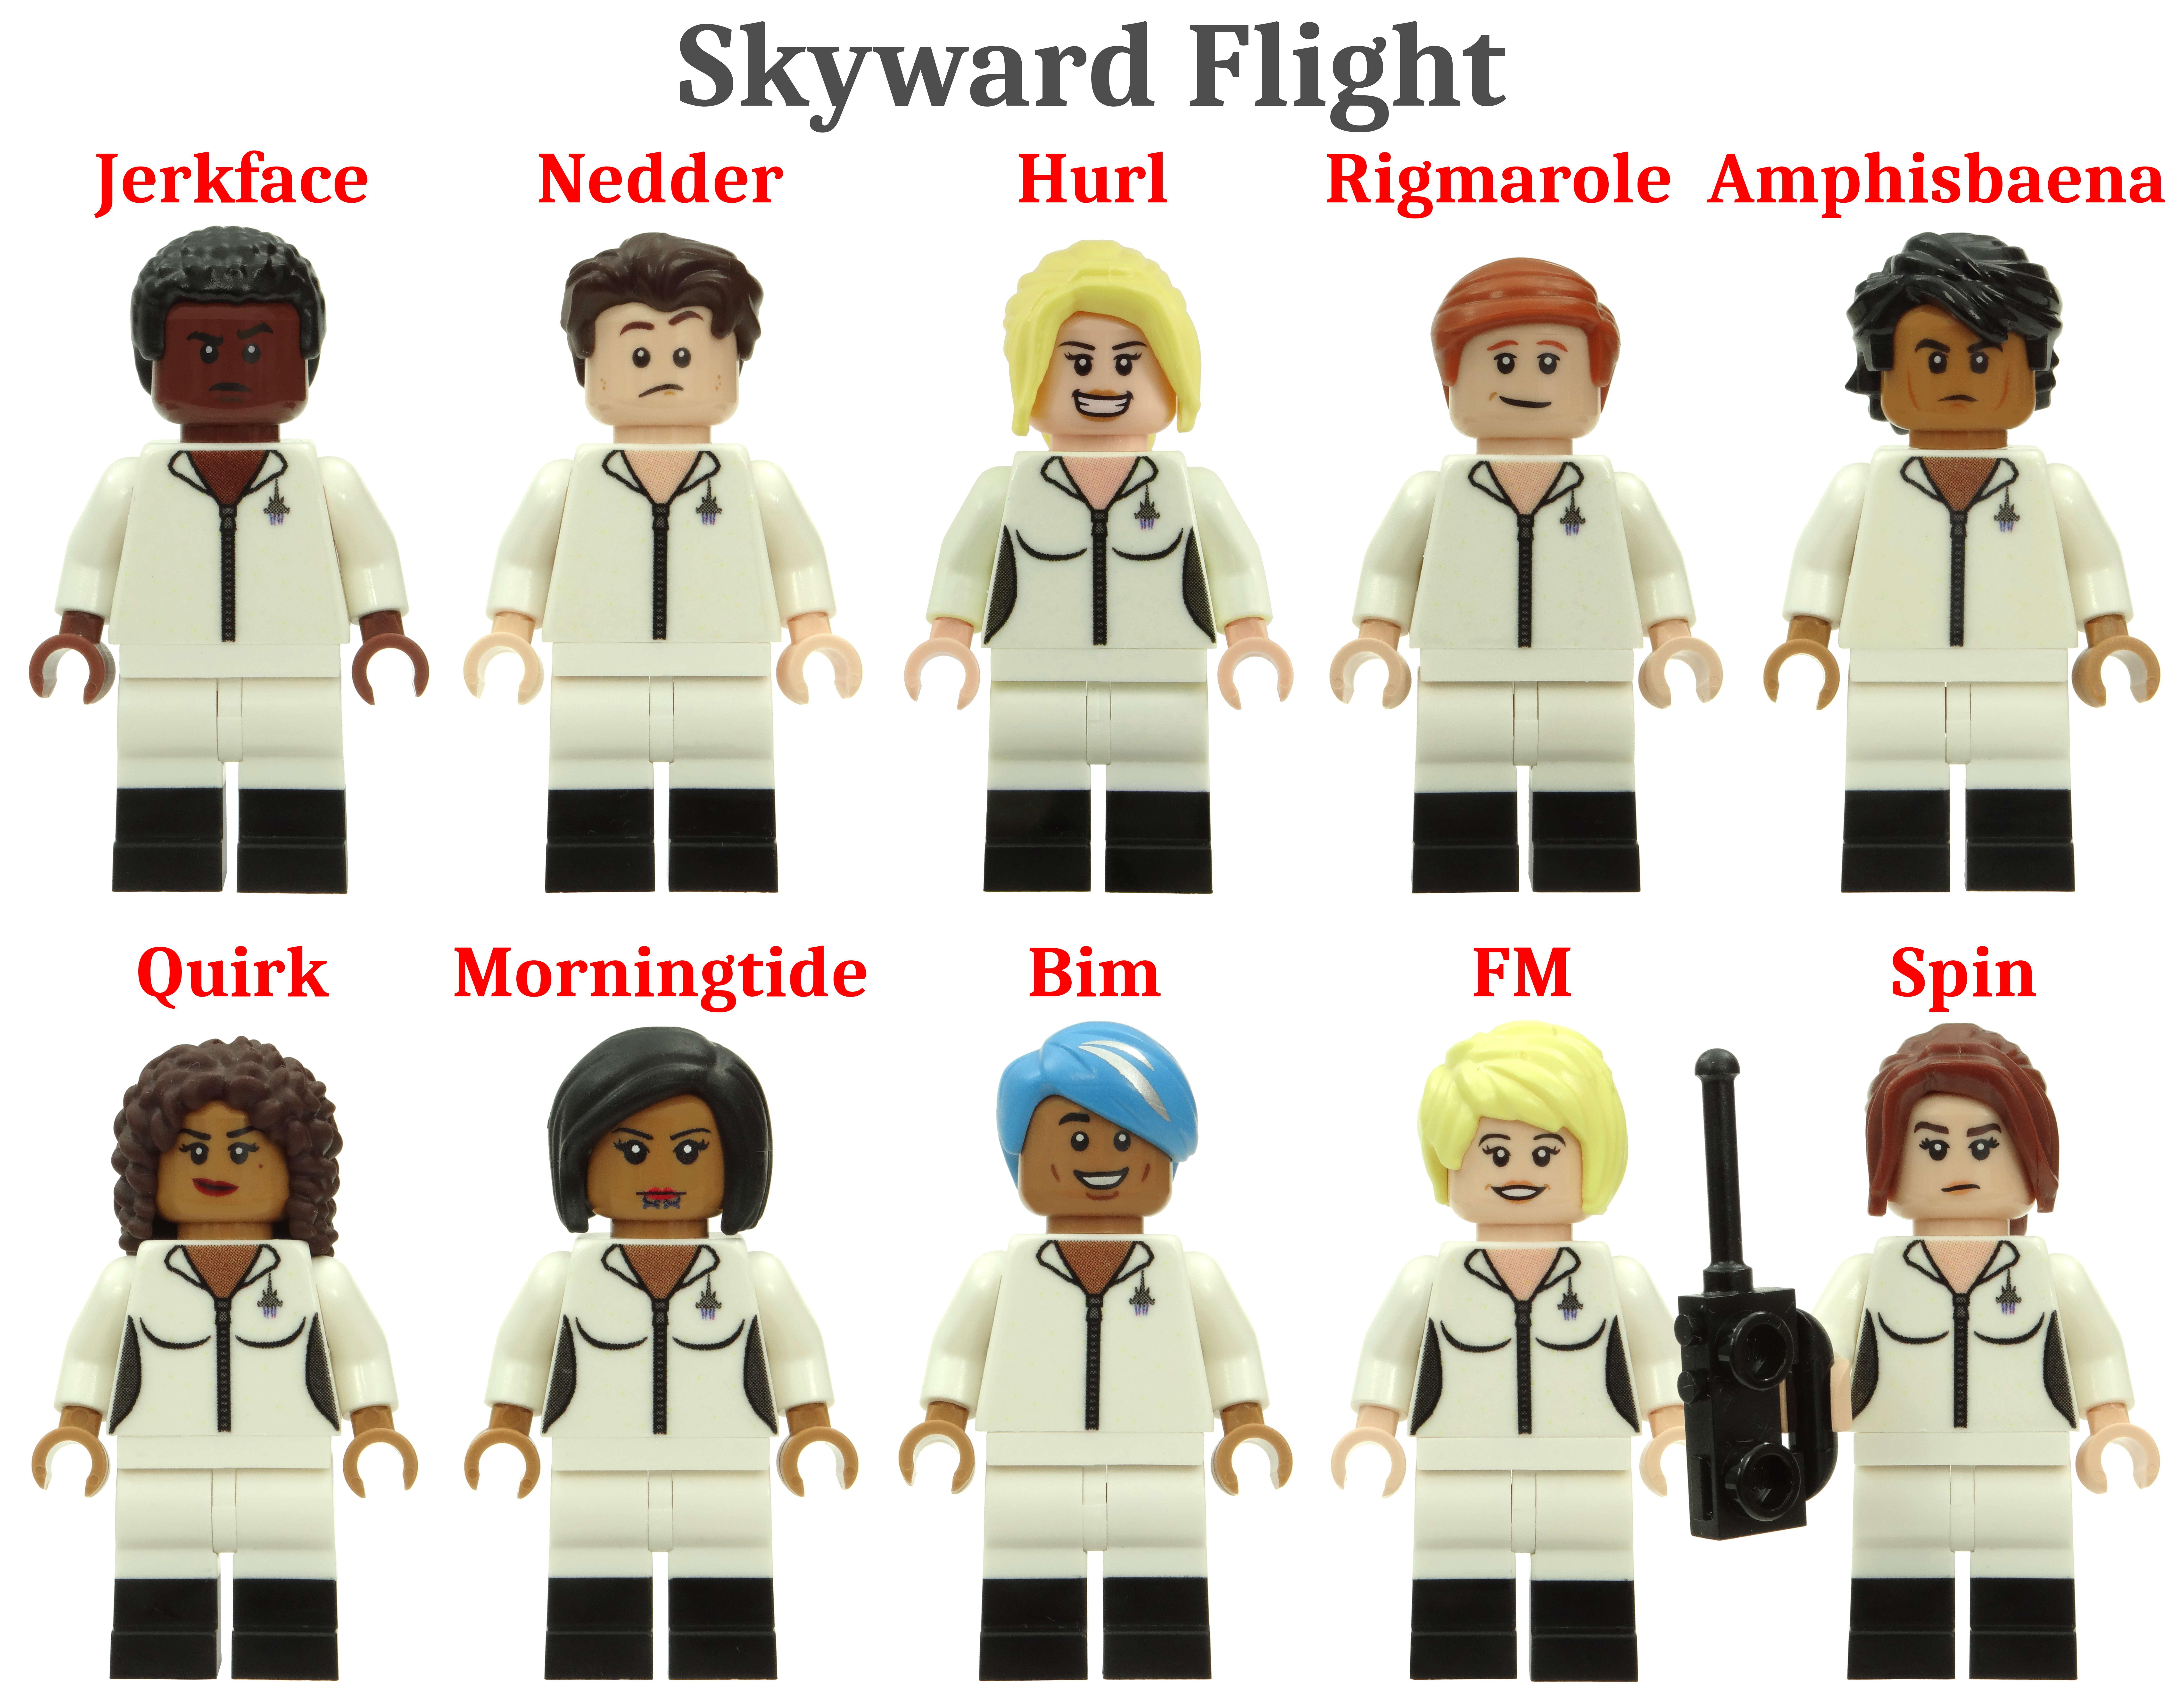 skyward-characters-cadets